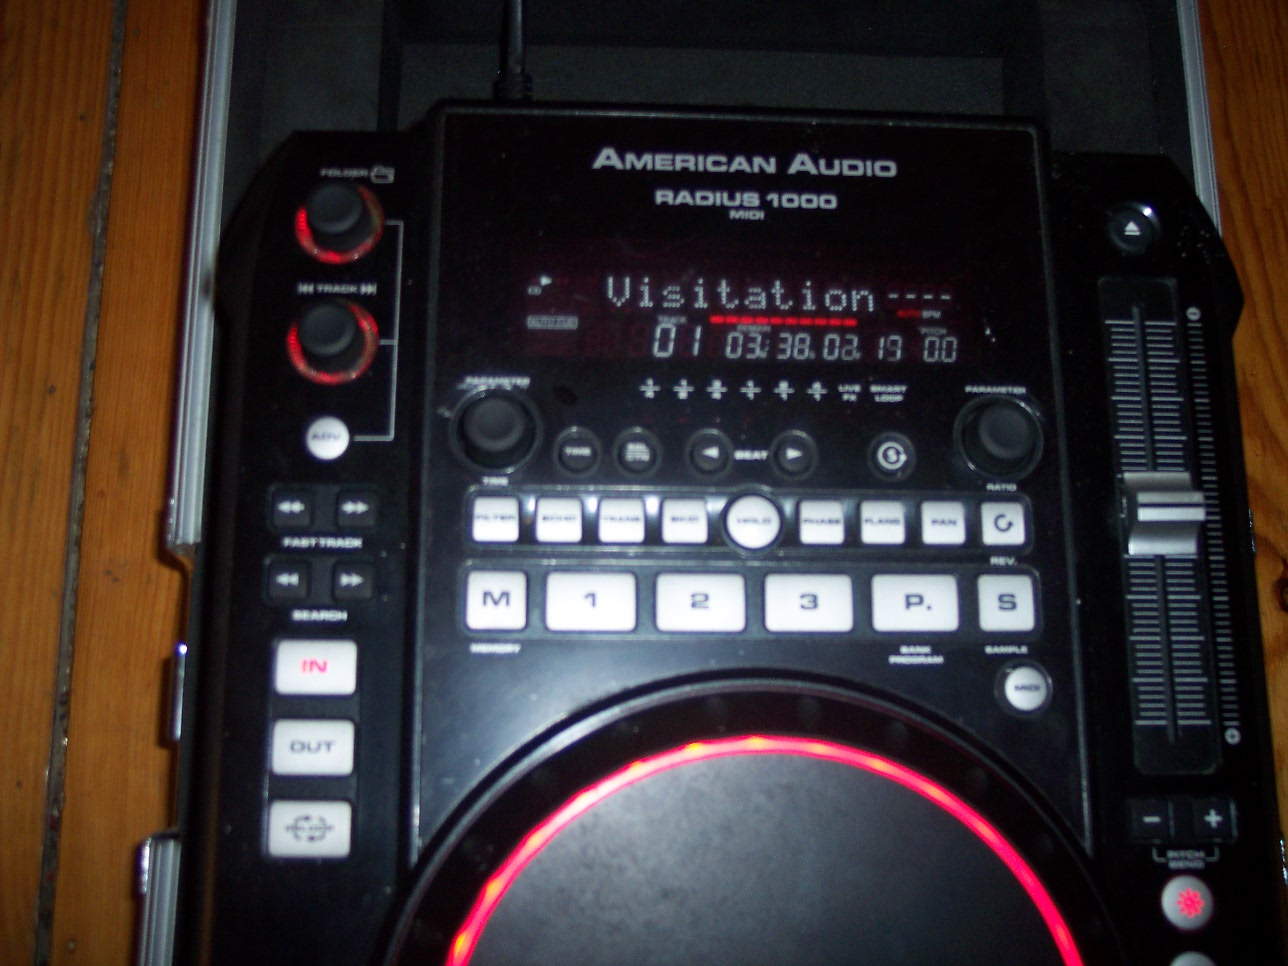 American Audio Radius 1000 image (#386151) - Audiofanzine on american dj lighting, audio 4 dj, american dj amplifier, american mobile dj, american dj supply, american standard service equipment, american dj equipment speakers,